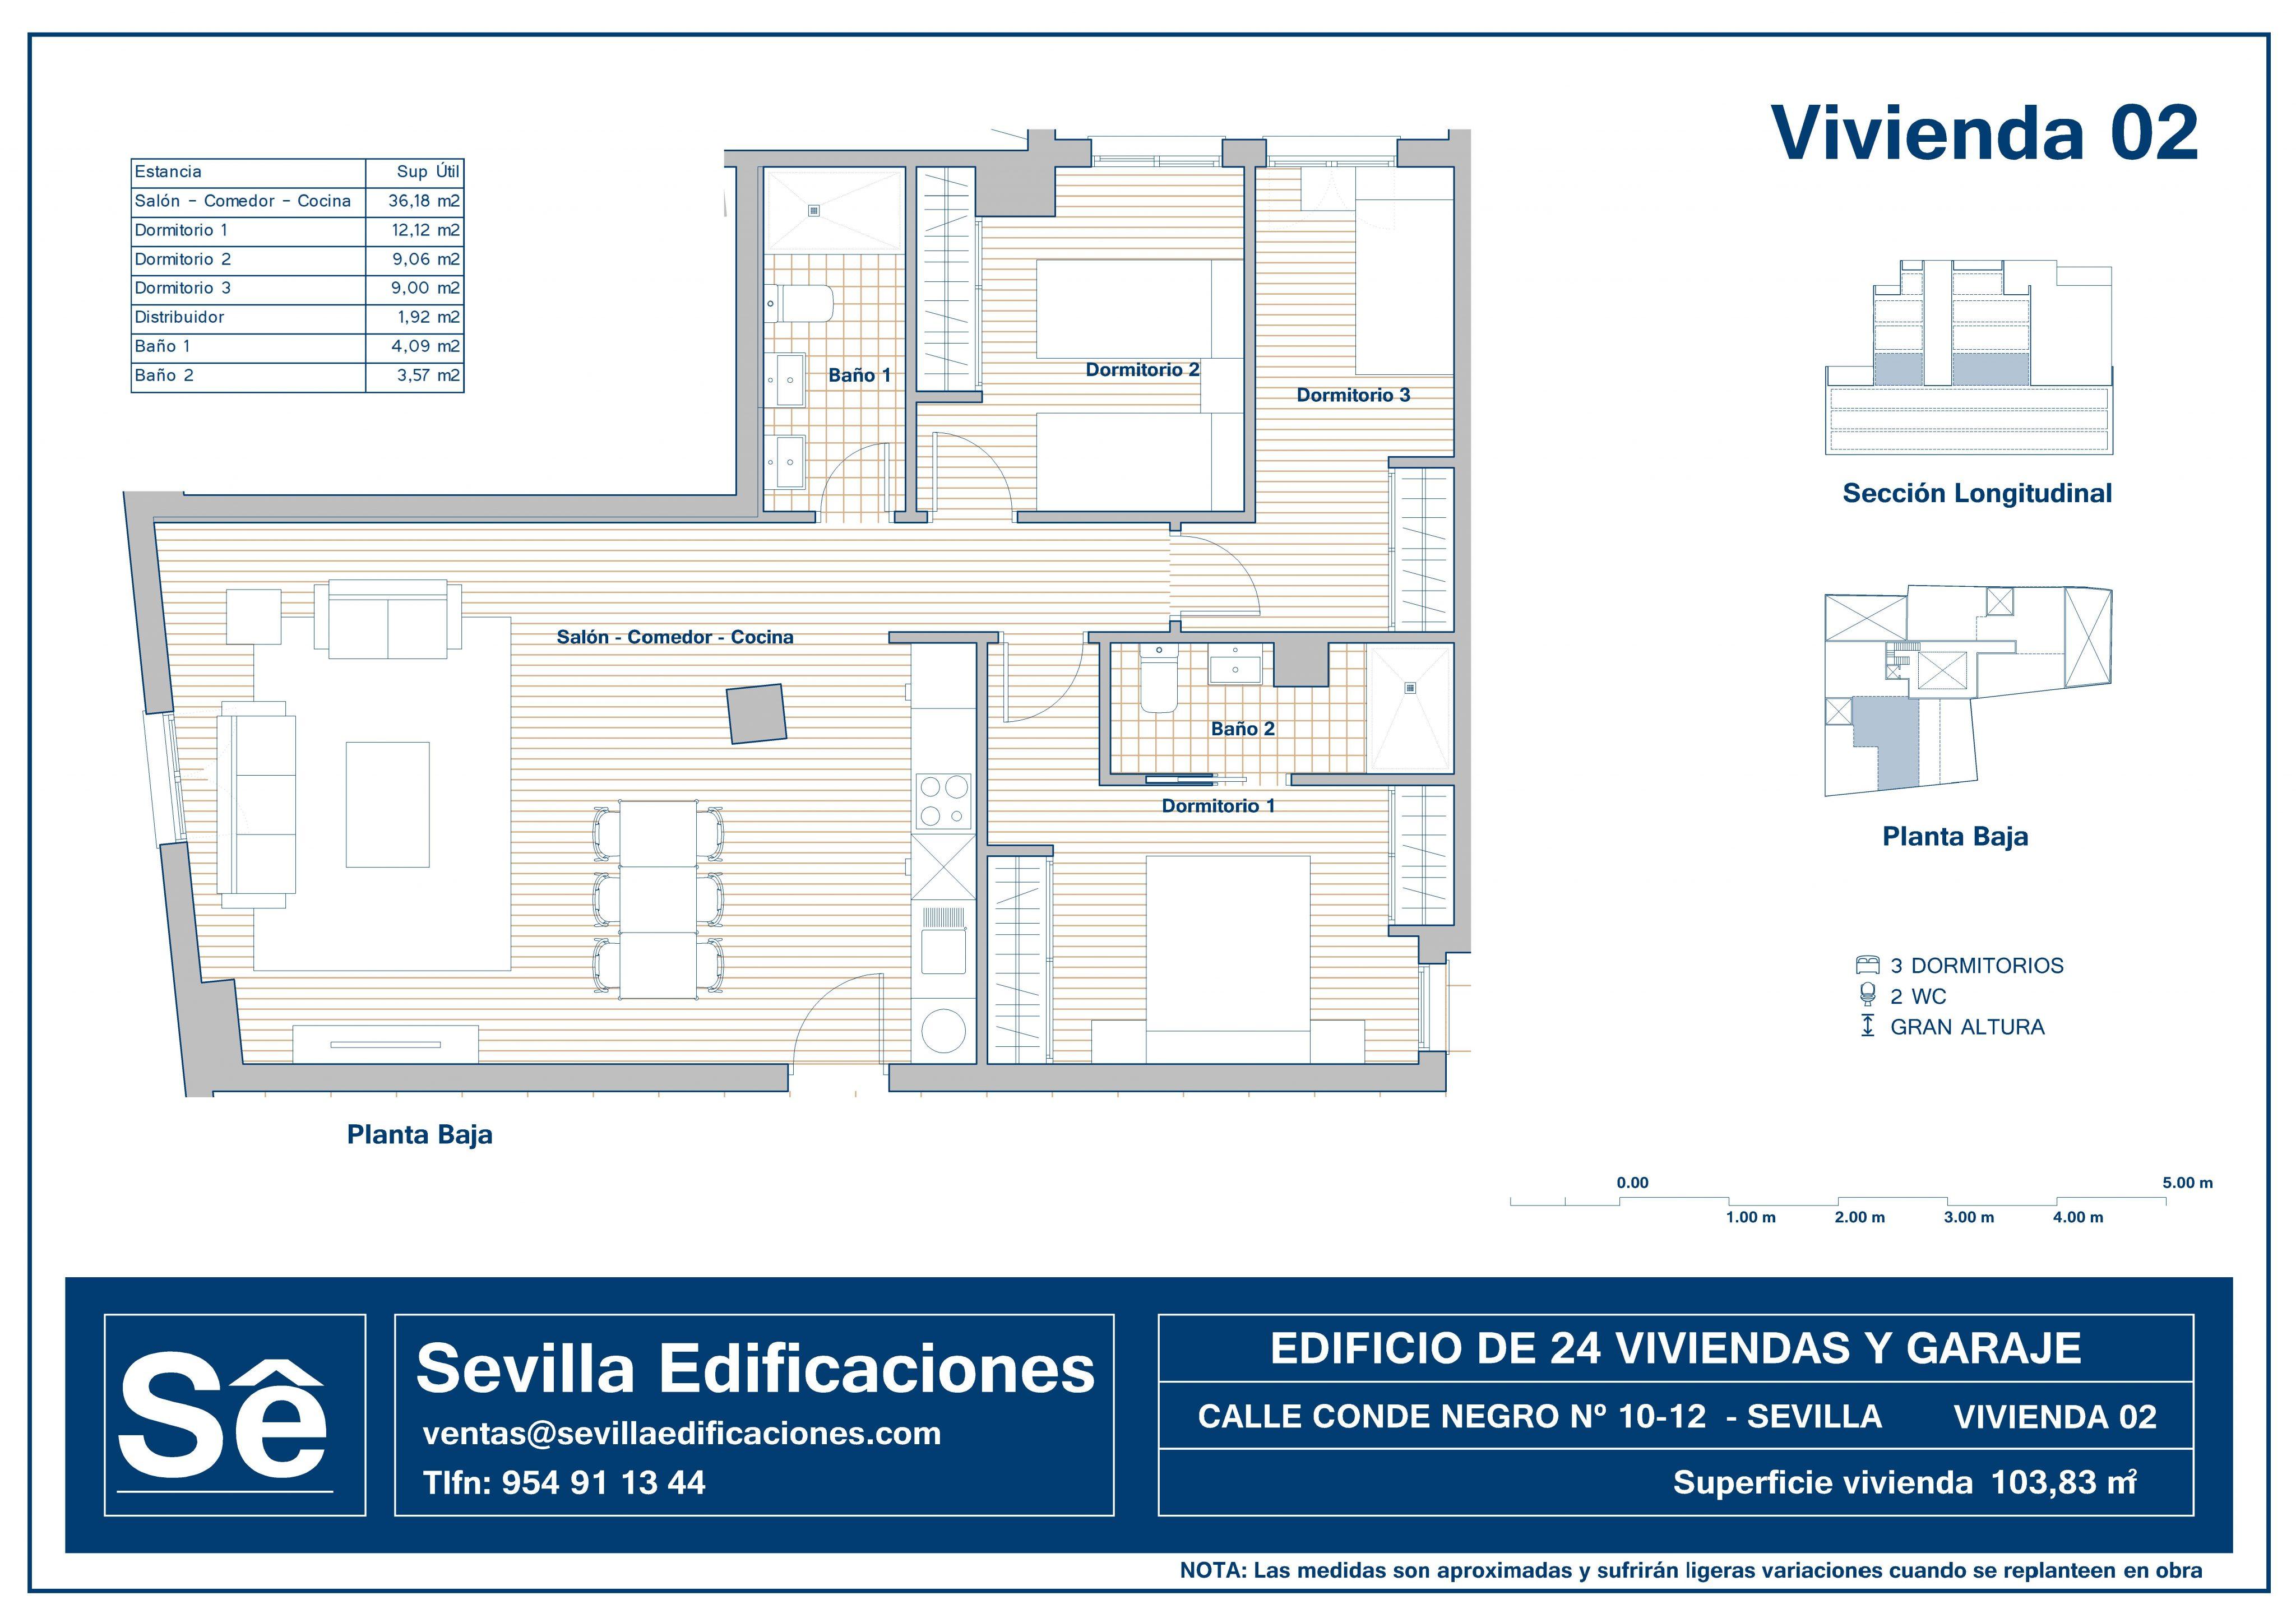 CONDENEGRO_VIVIENDA_02